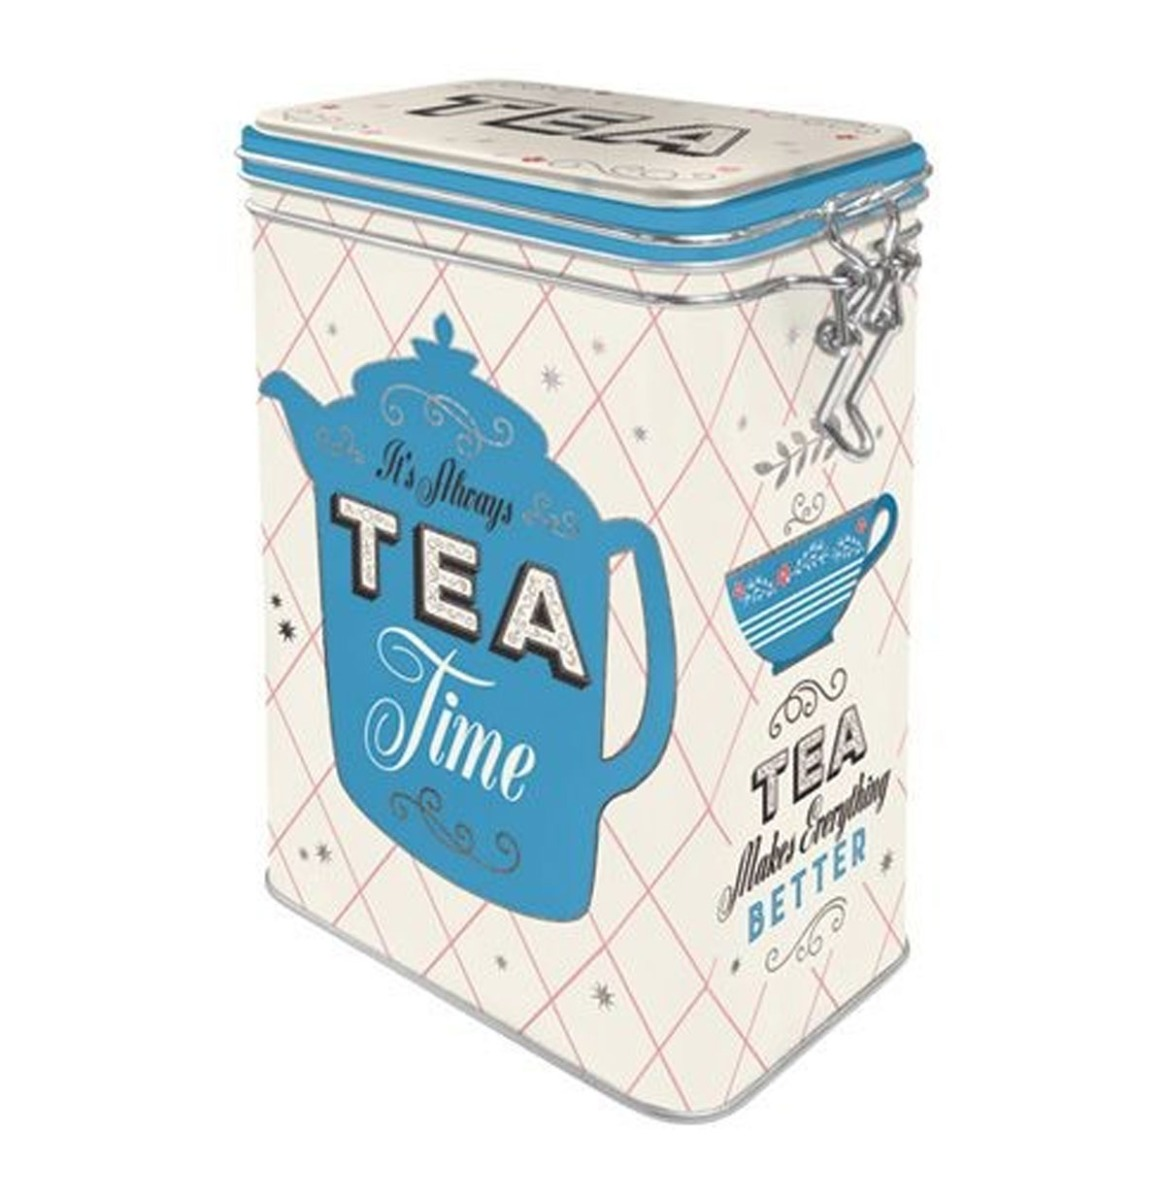 It's Always Tea Time Tinnen Blik Met Klipsluiting